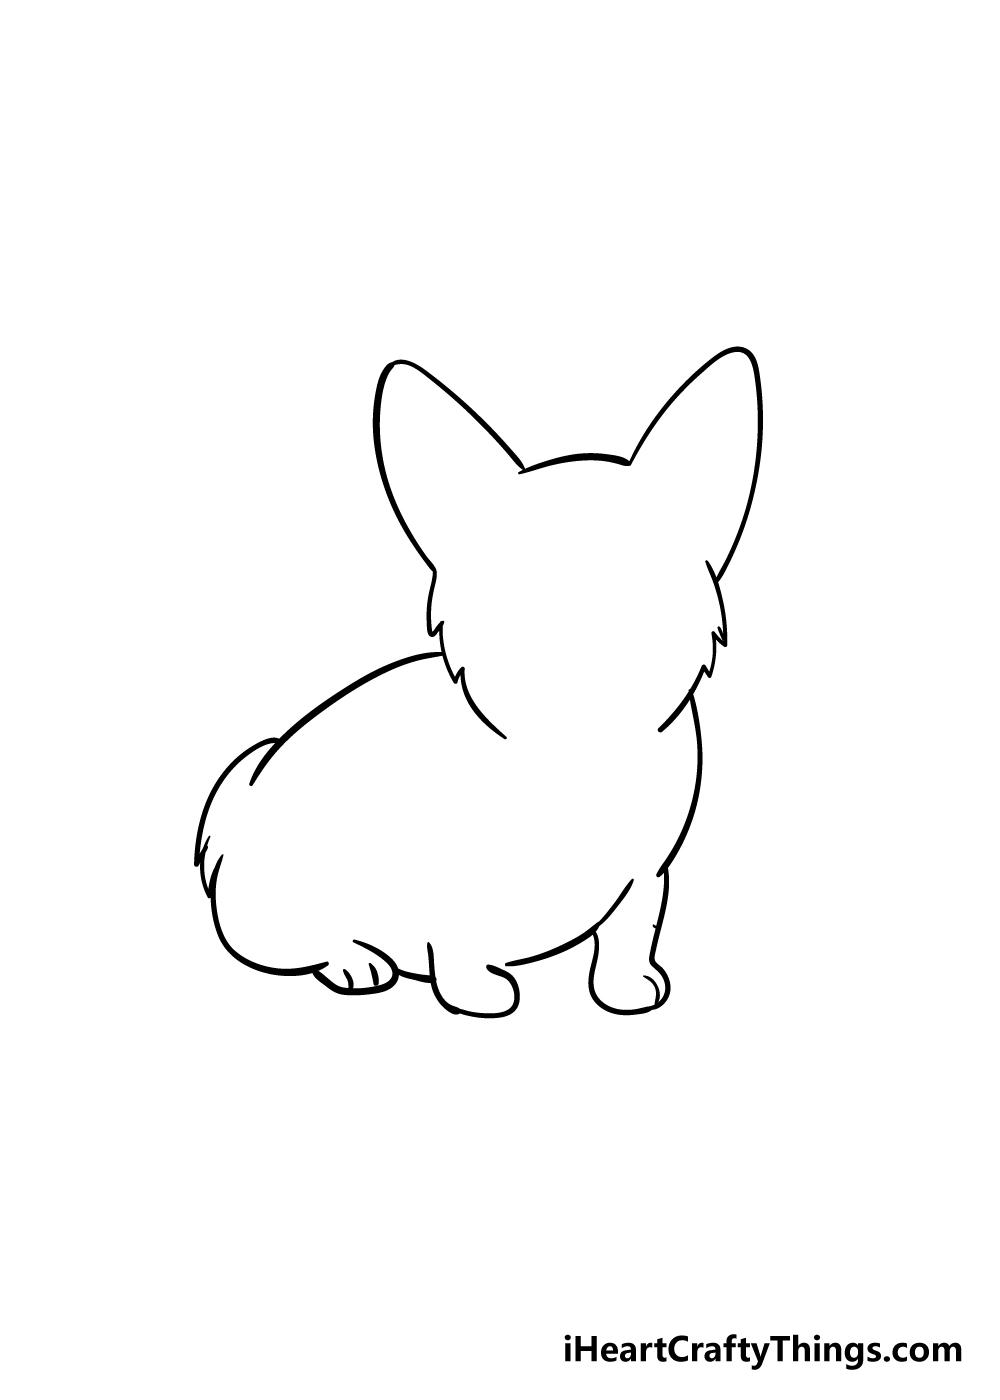 corgi drawing step 2